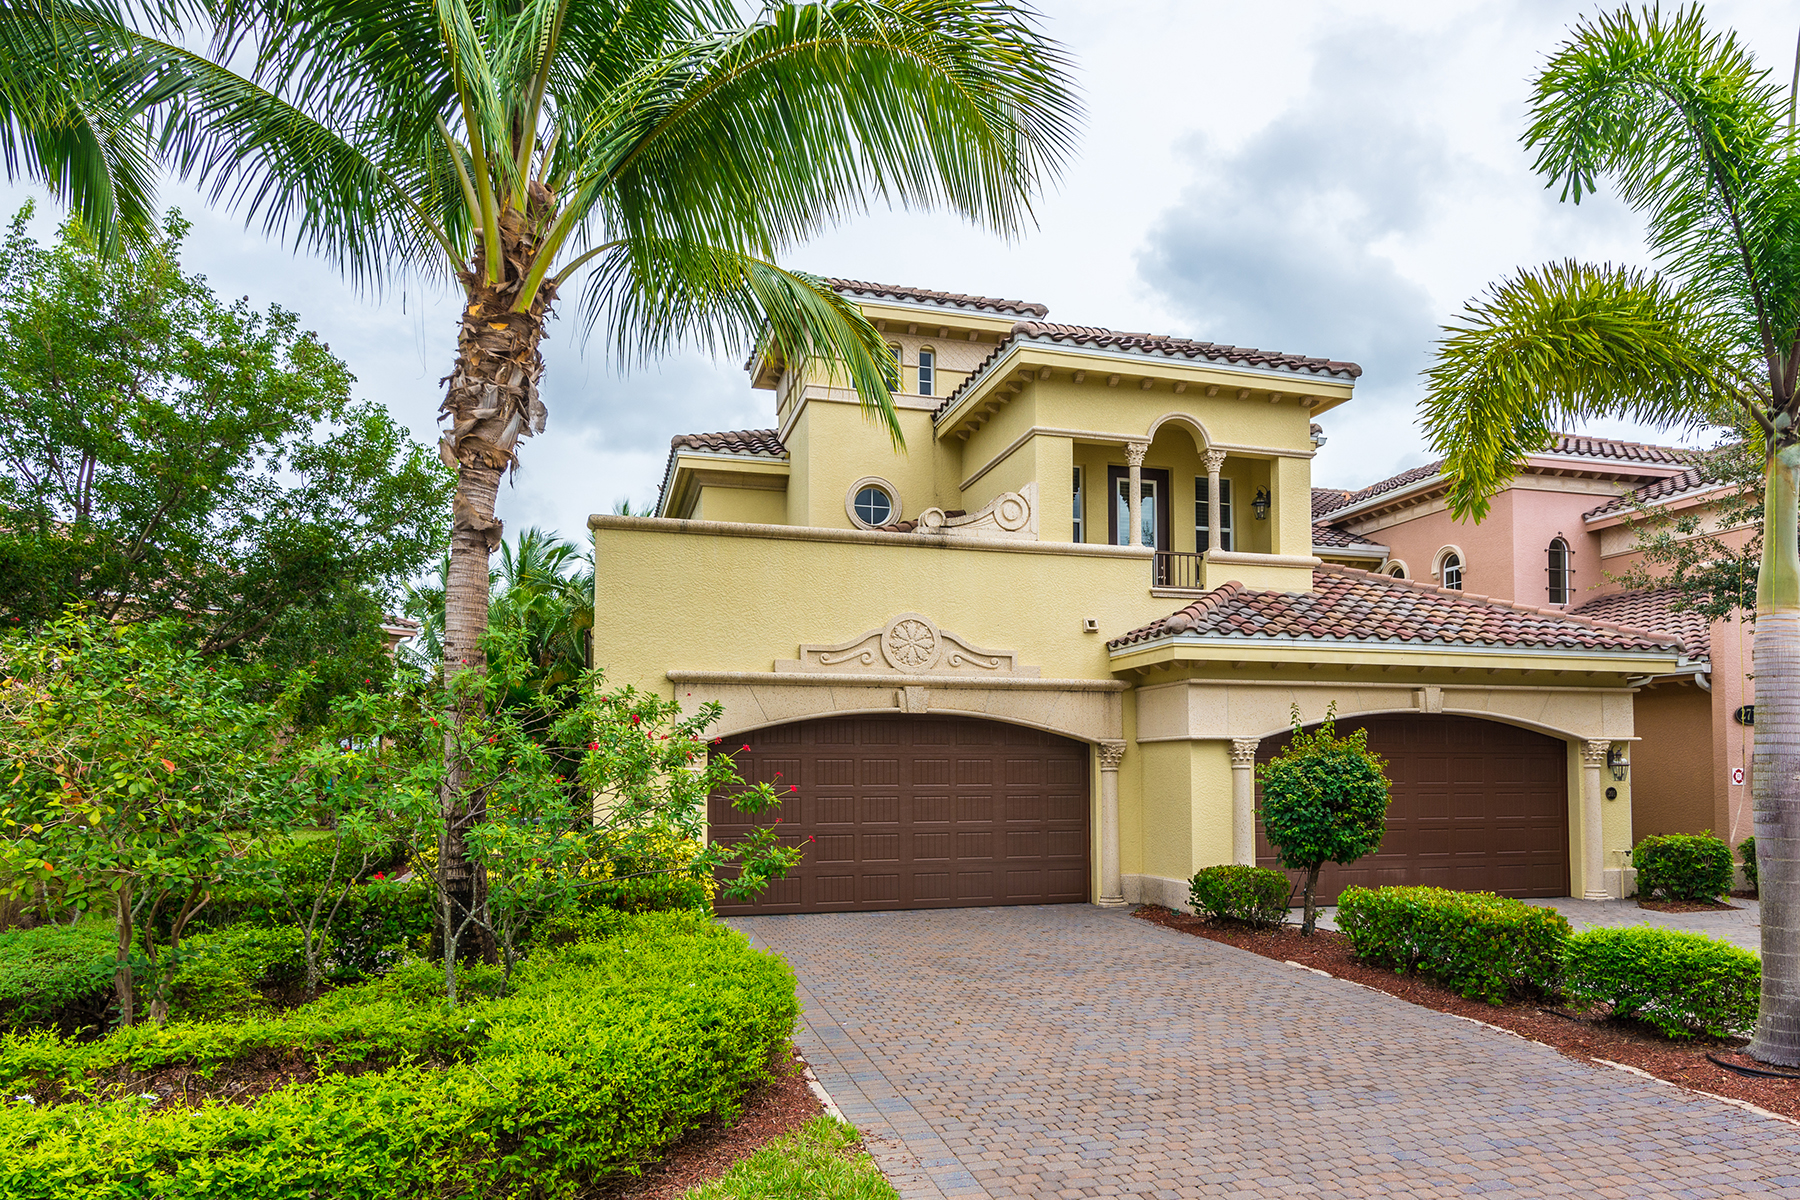 Nhà chung cư vì Bán tại FIDDLER'S CREEK - CALLISTA 2718 Callista Ct 101 Naples, Florida 34114 Hoa Kỳ